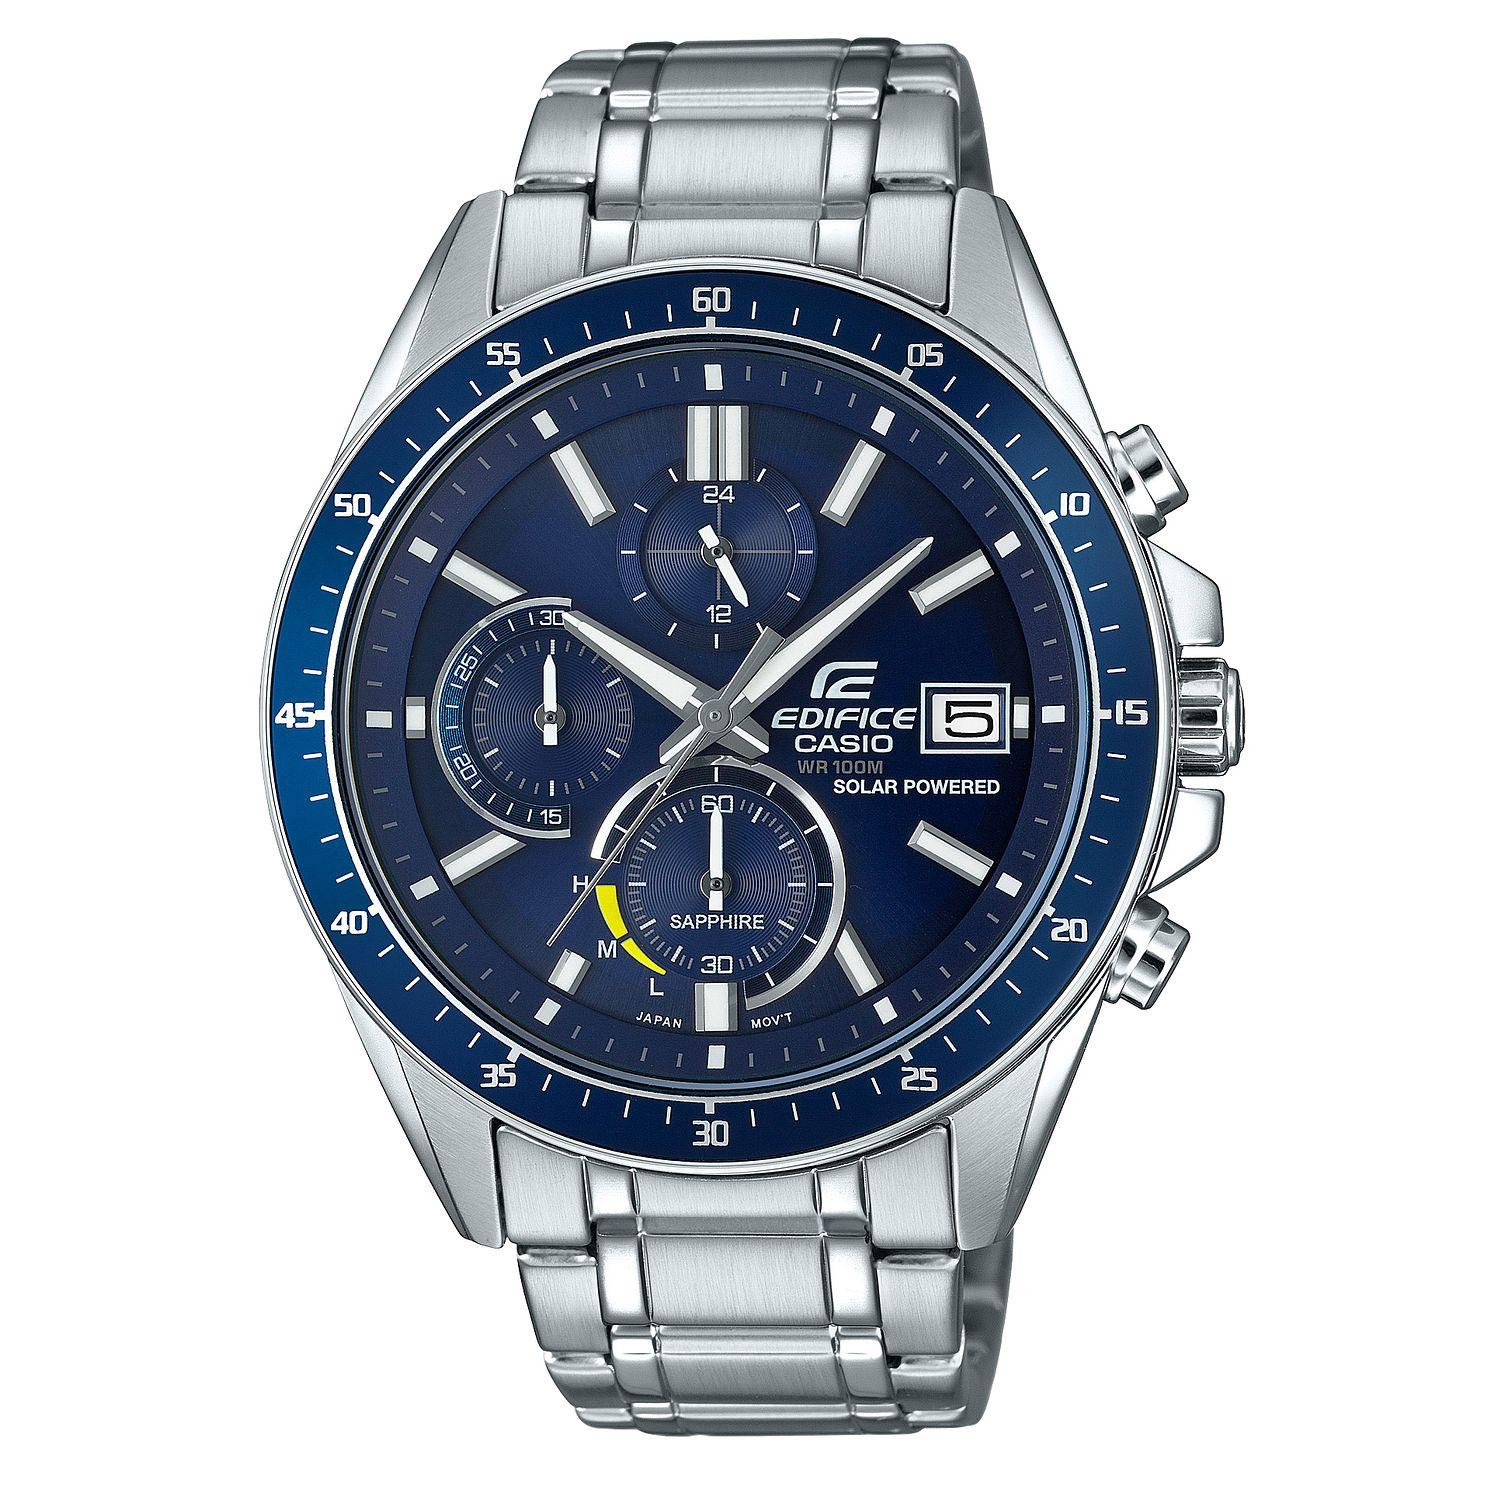 Casio Edifice Men's Sapphire Solar Powered Steel Bracelet Watch £79 at H.Samuel